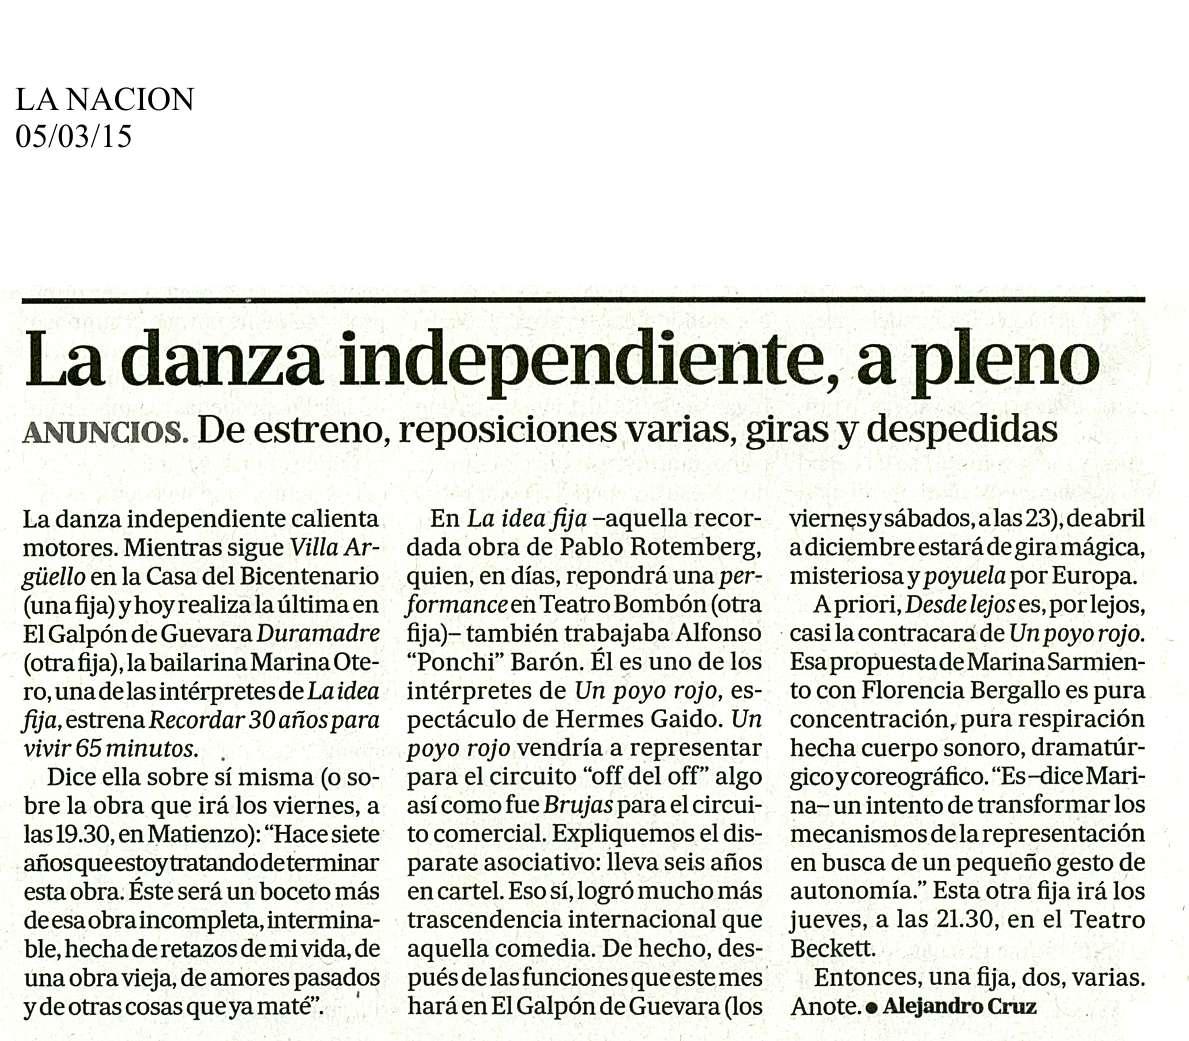 LA NACION, 5 DE MAR.